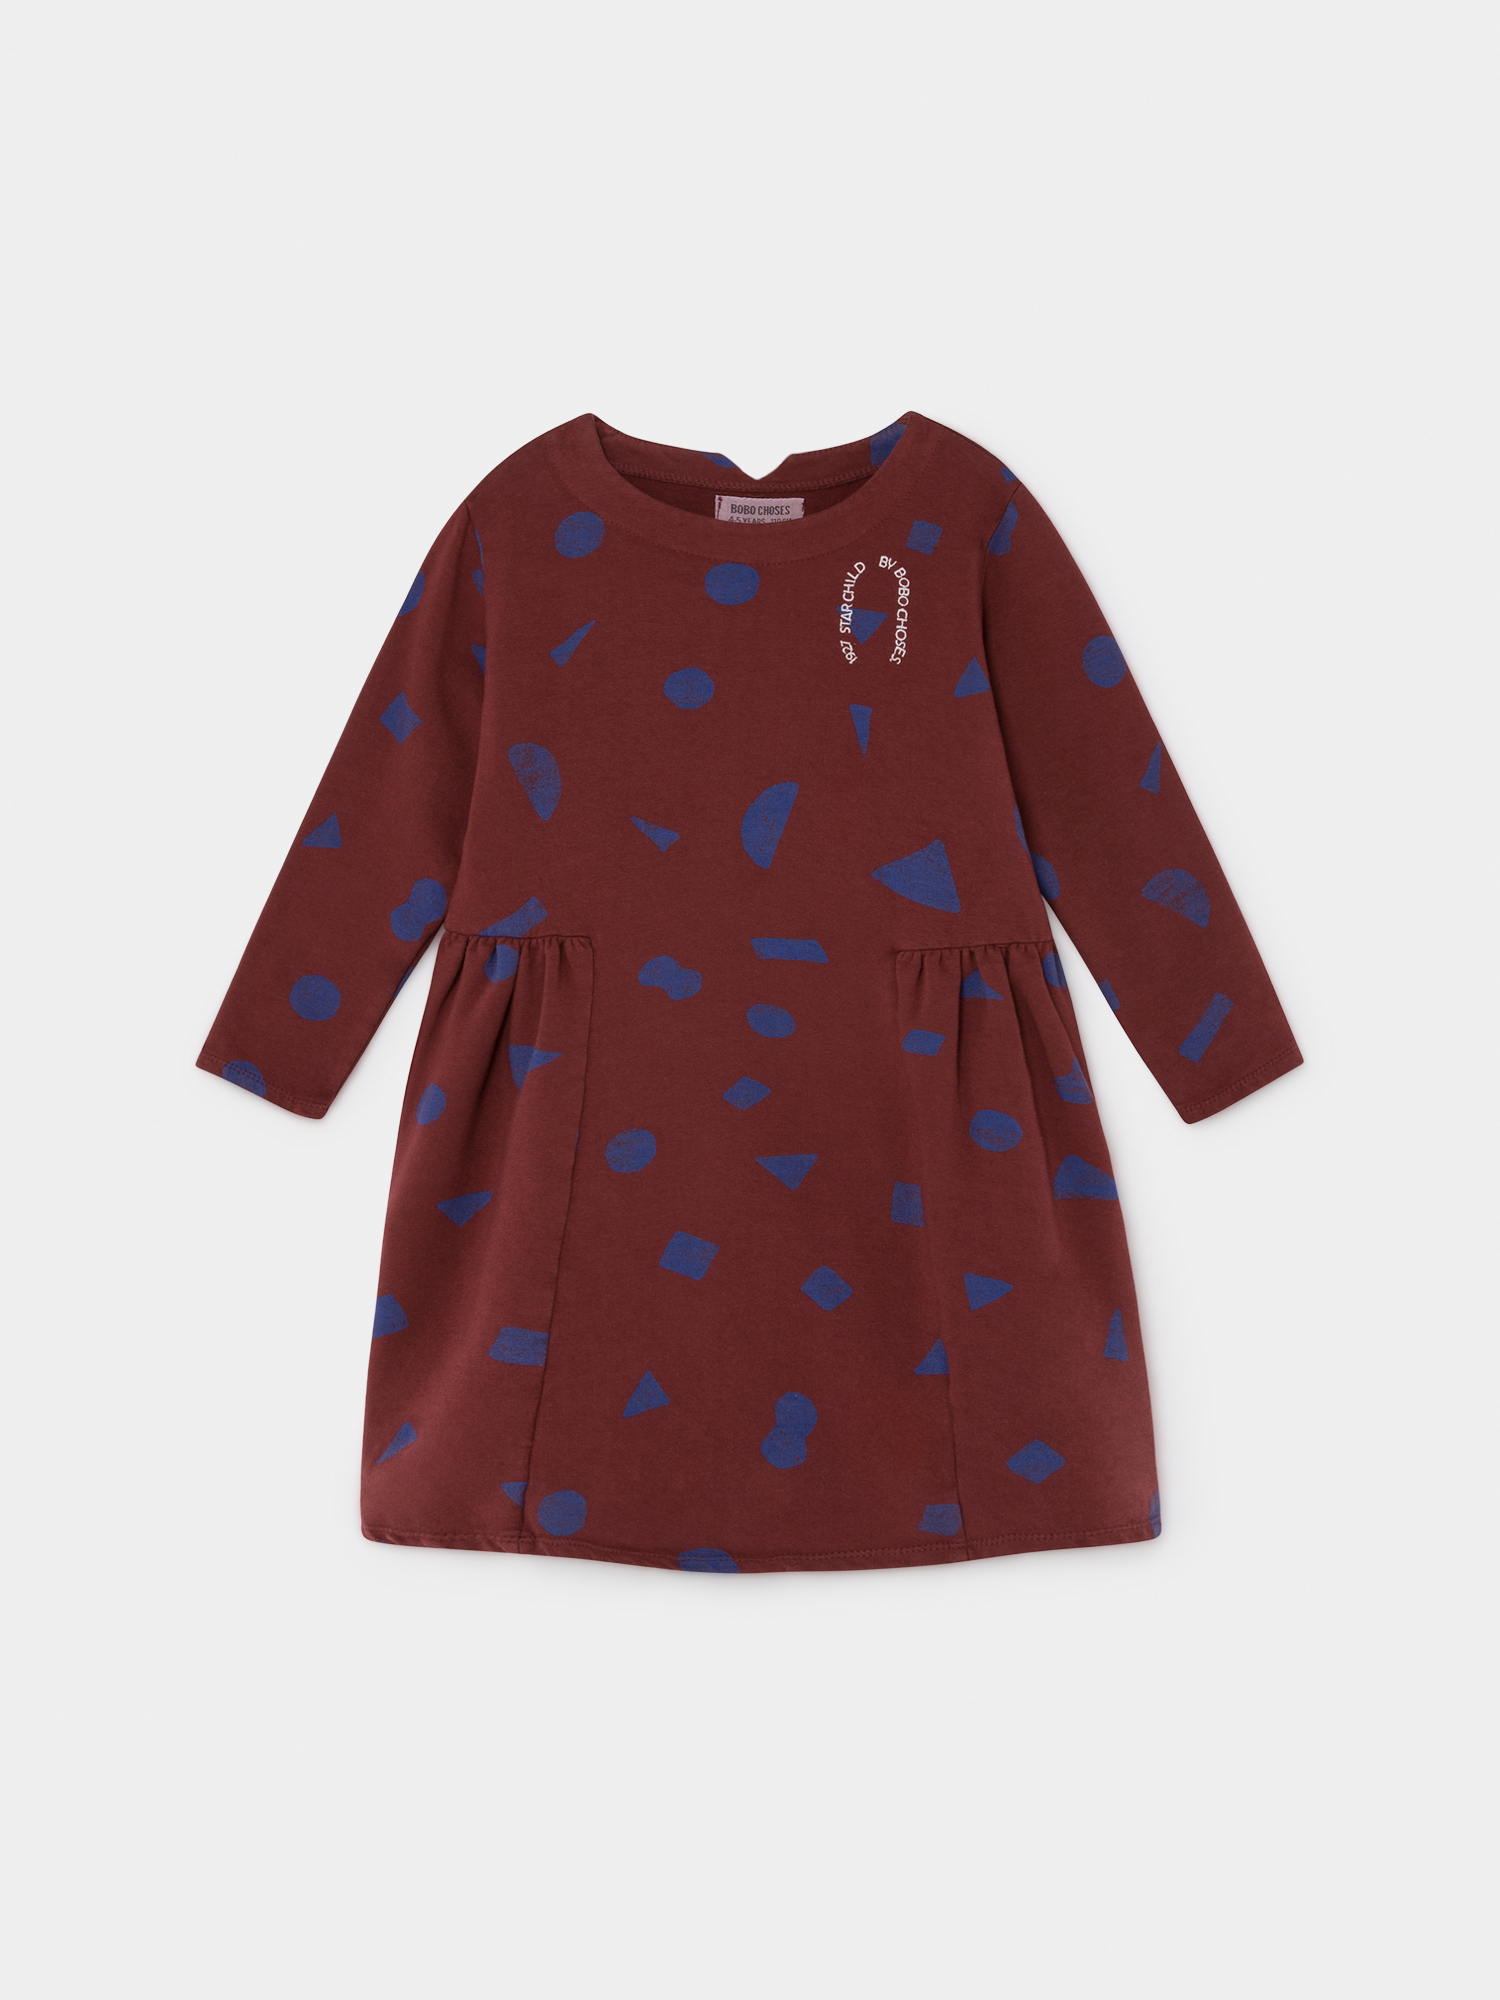 《BOBO CHOSES 2019AW》All Over Stuff fleece dress / 2-9Y